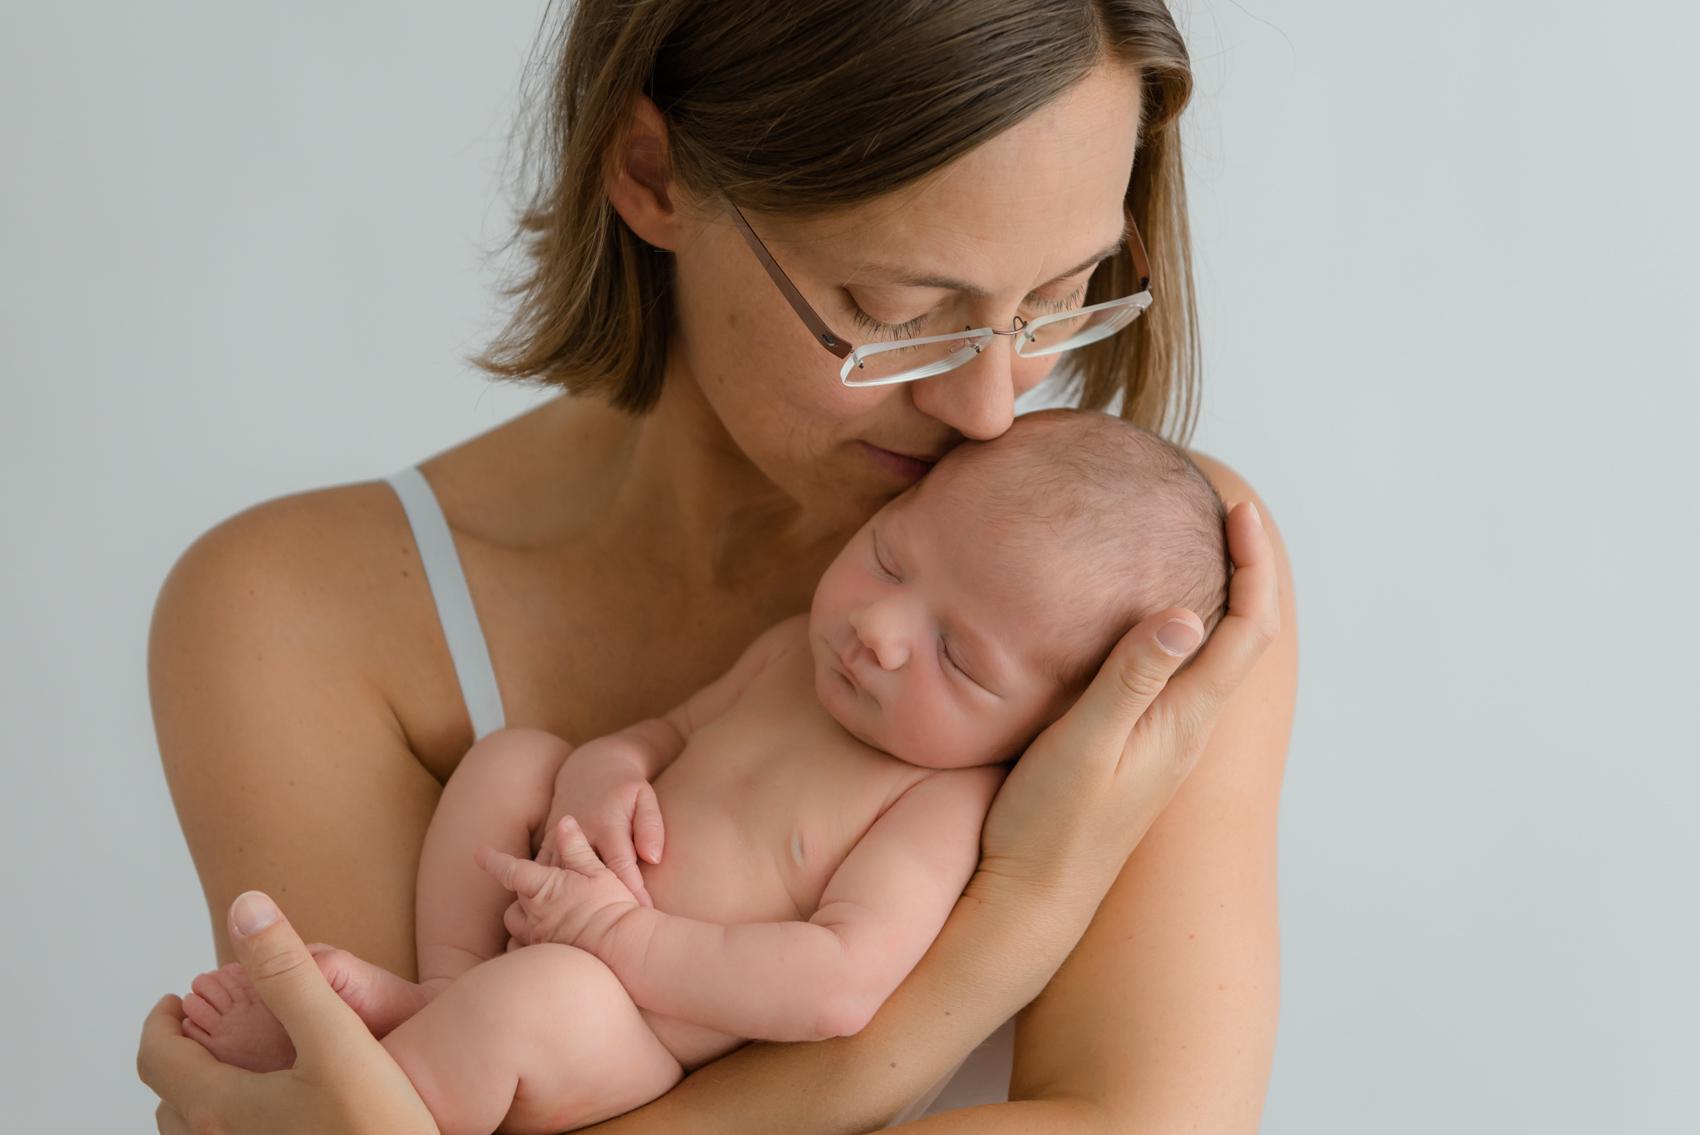 Newborn Fotoshooting Schweinfurt-9